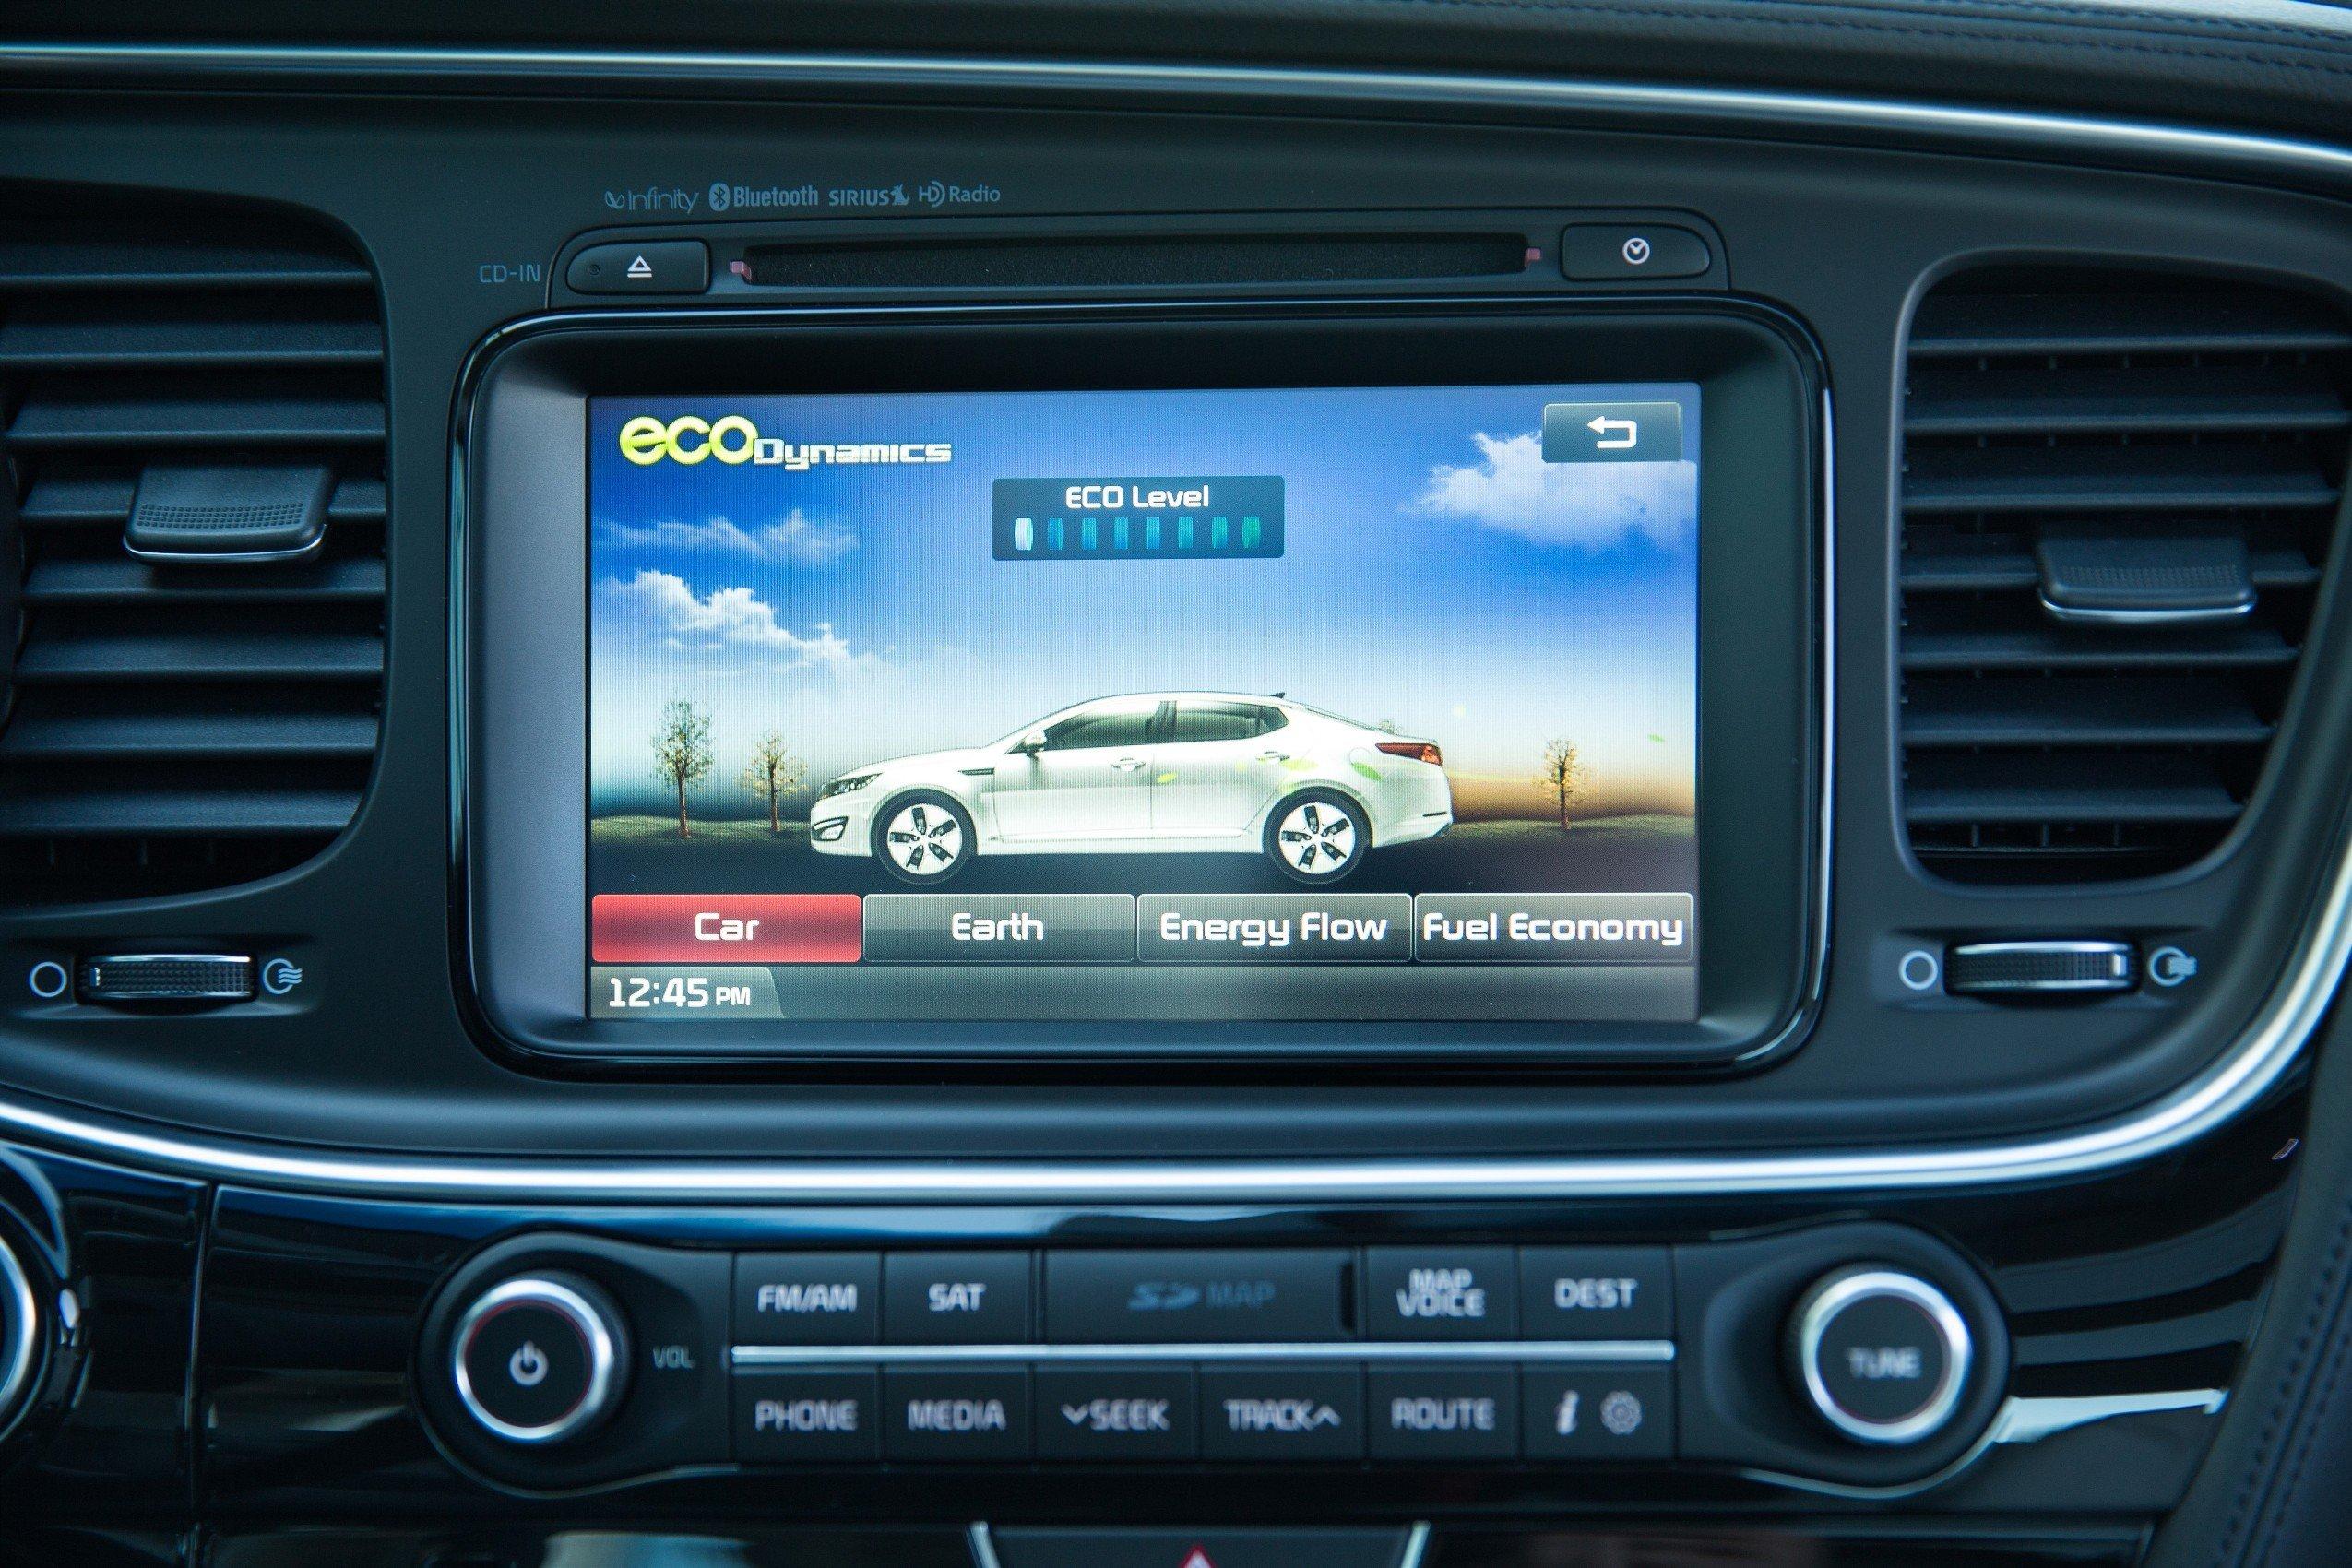 turbo automobile quarters news sx optima hybrid kia magazine three review front